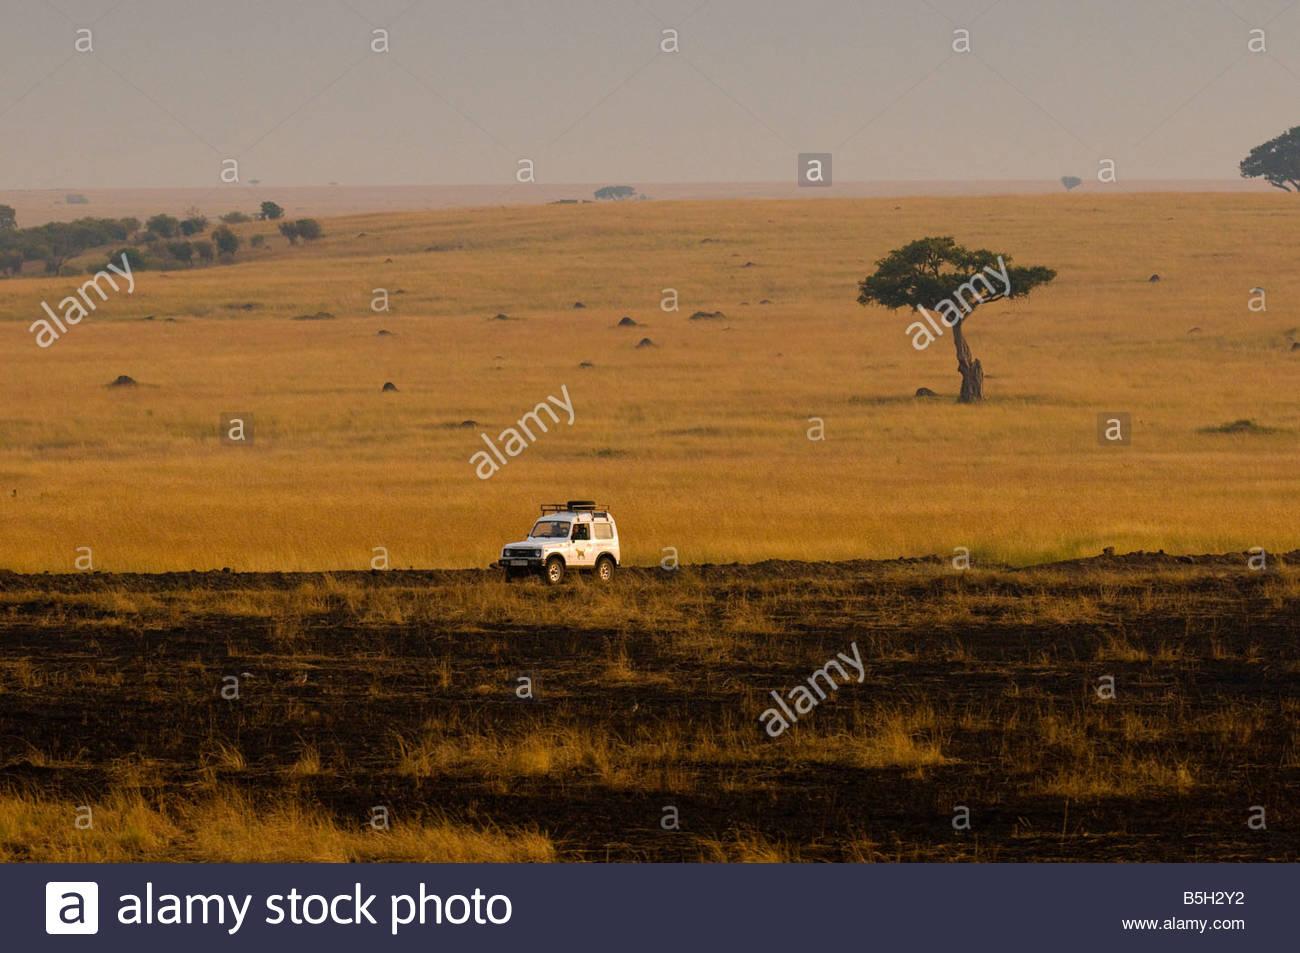 Aerial view of a park vehicle Masai Mara National Reserve Kenya - Stock Image